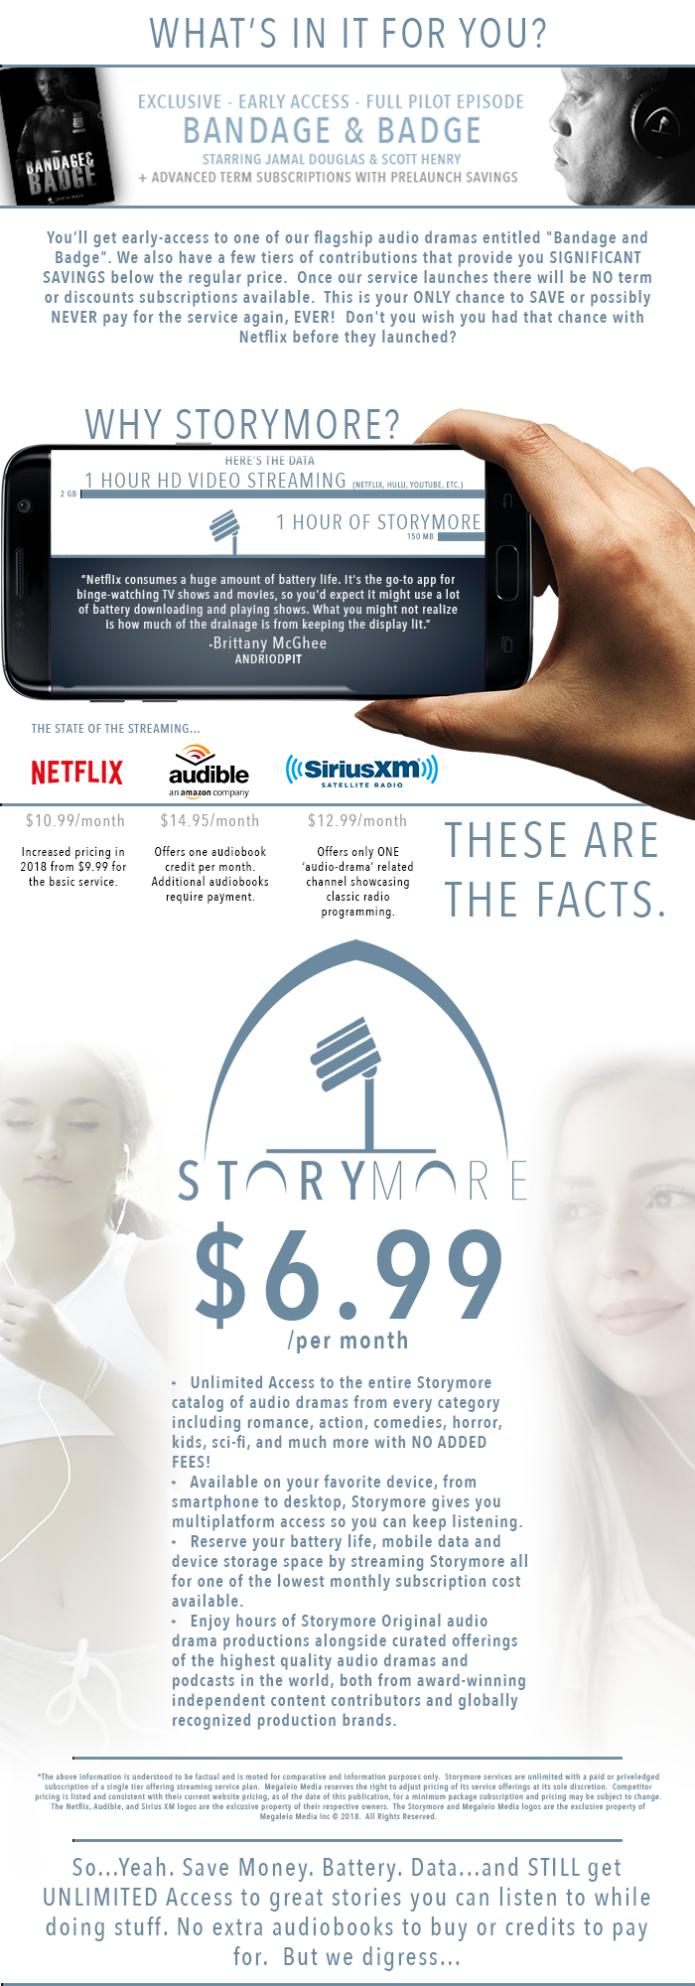 Storymore, Streaming Stimulating Stories! | Indiegogo